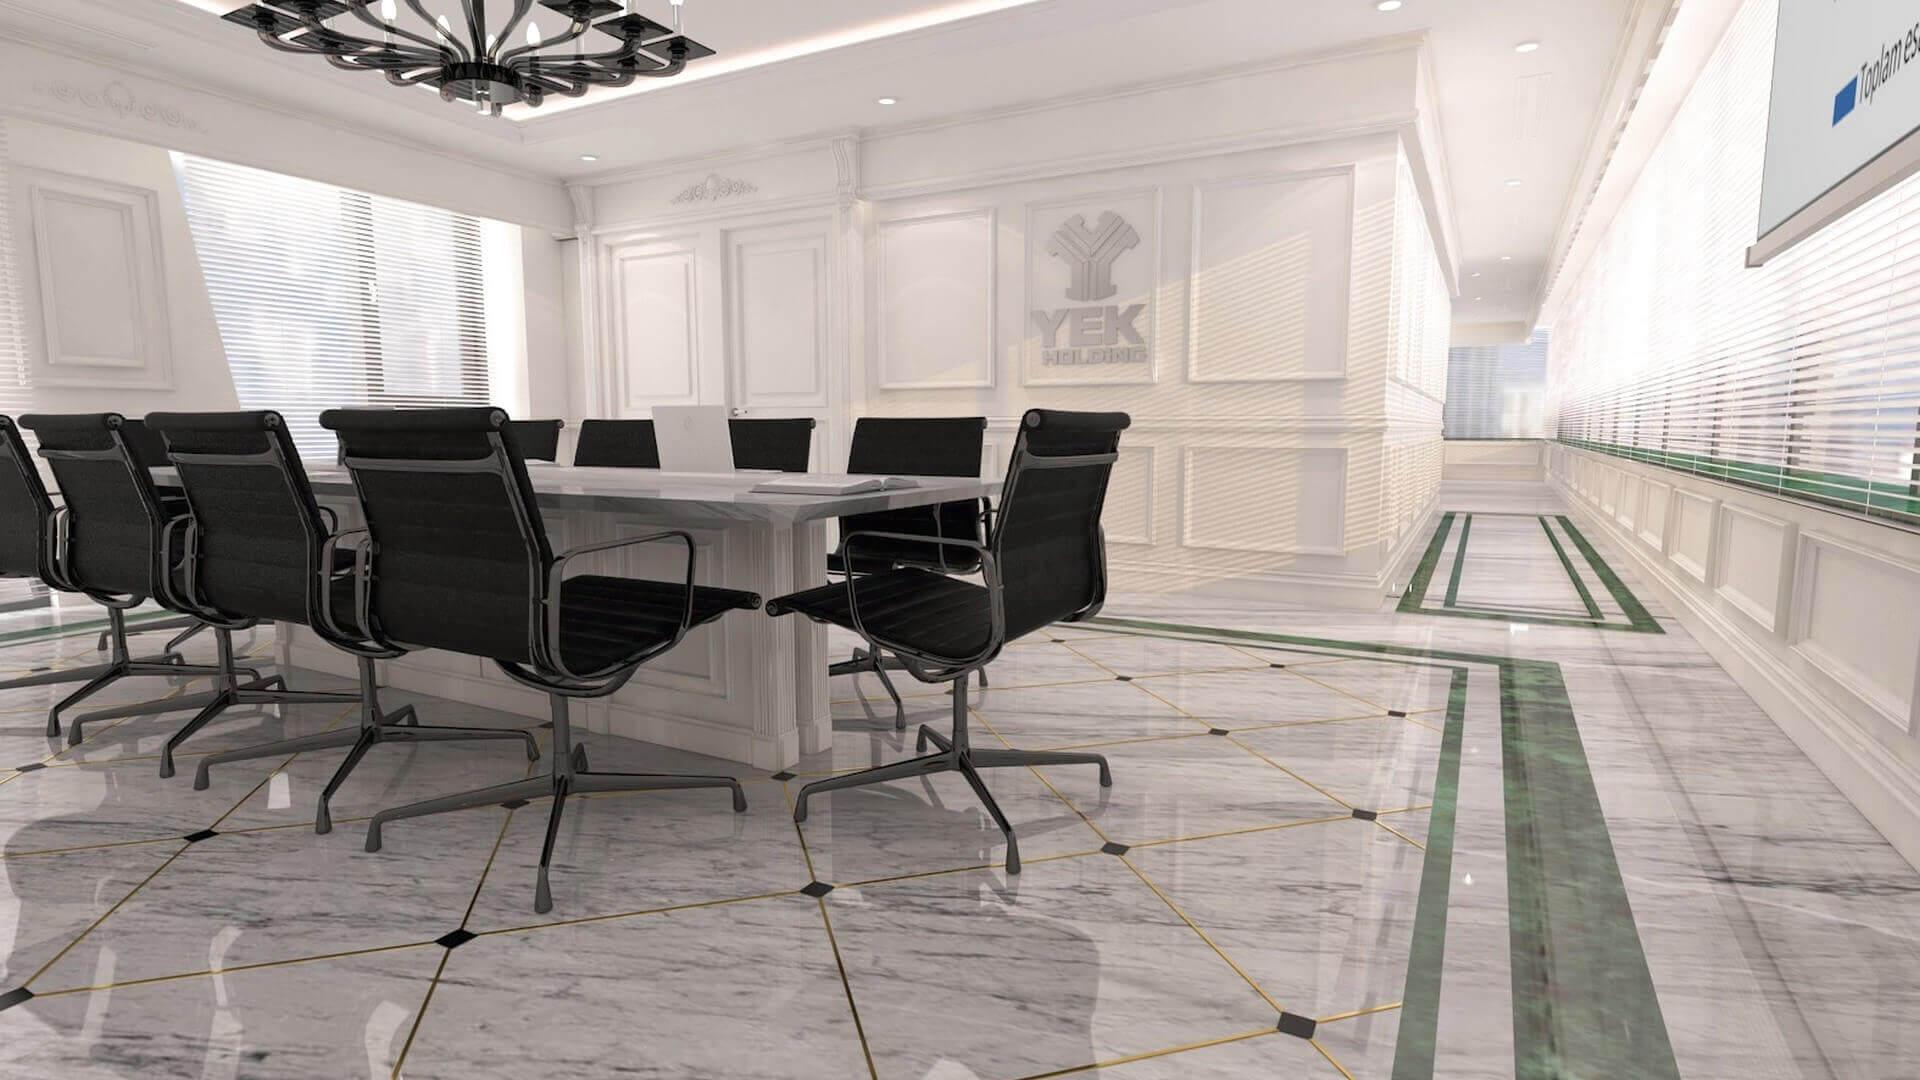 Secretary 2461 YEK Petrokimya Offices